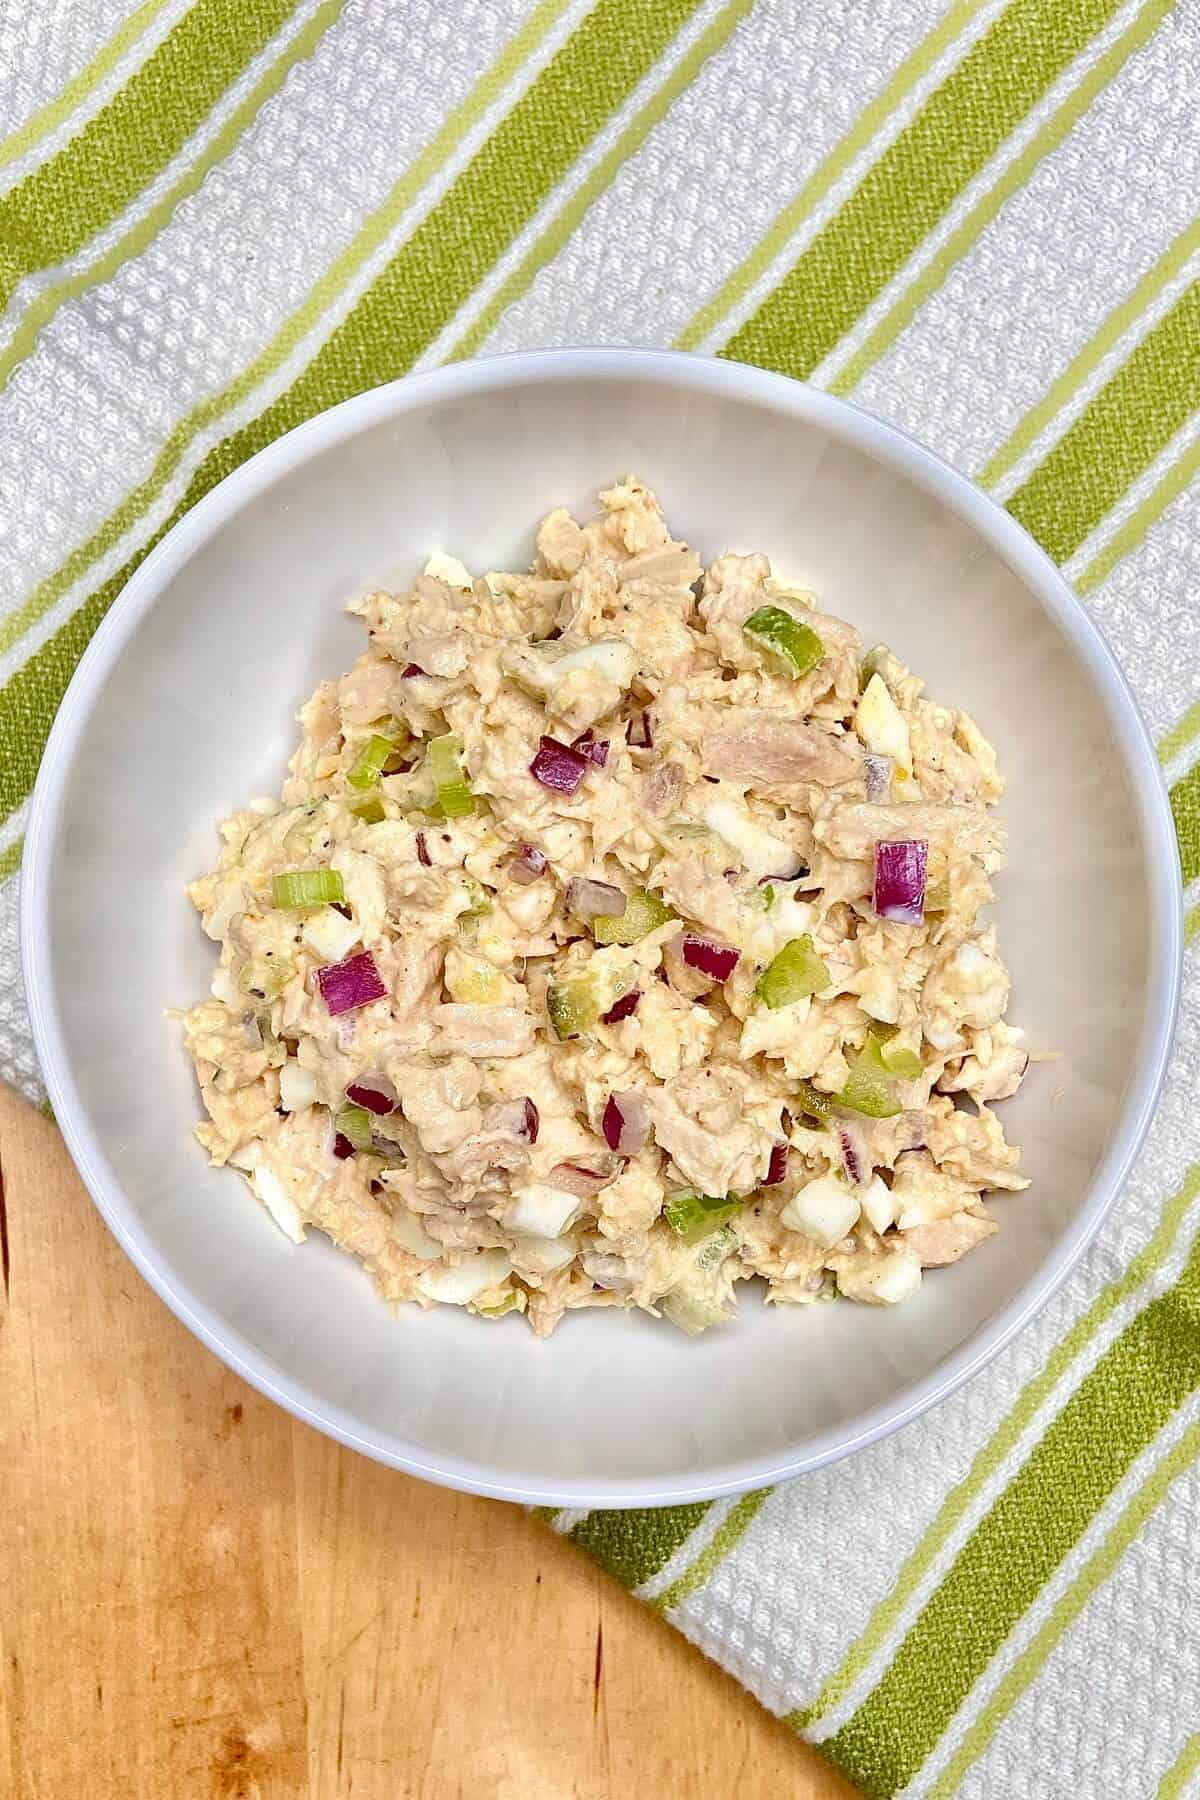 Southern Tuna Salad (Photo by Viana Boenzli)